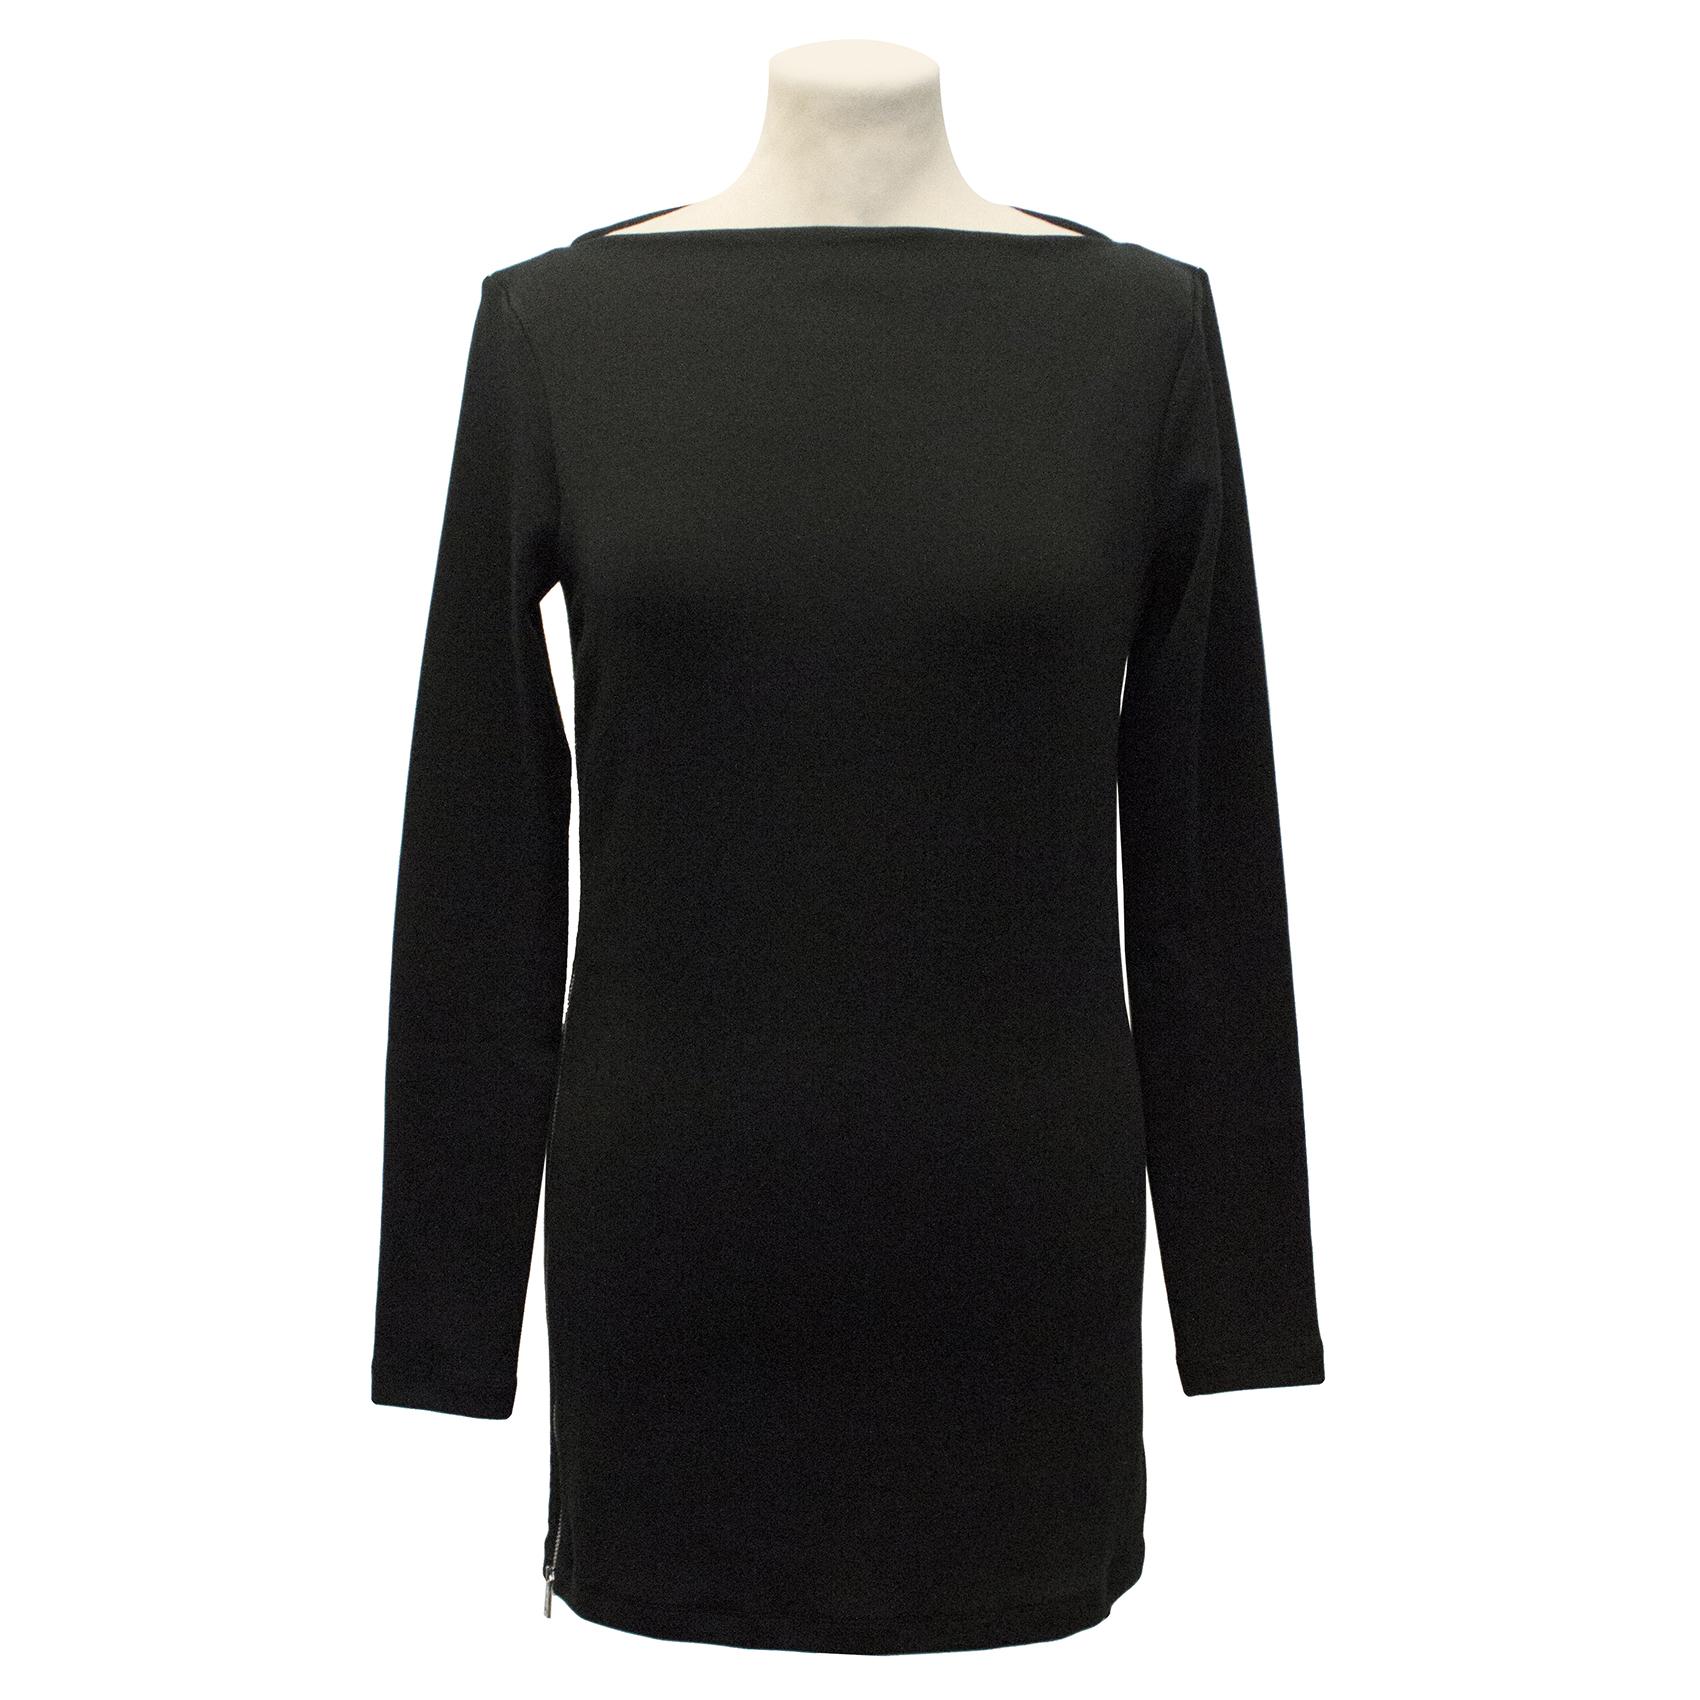 Ralph Lauren Black Label Black Knit Tunic